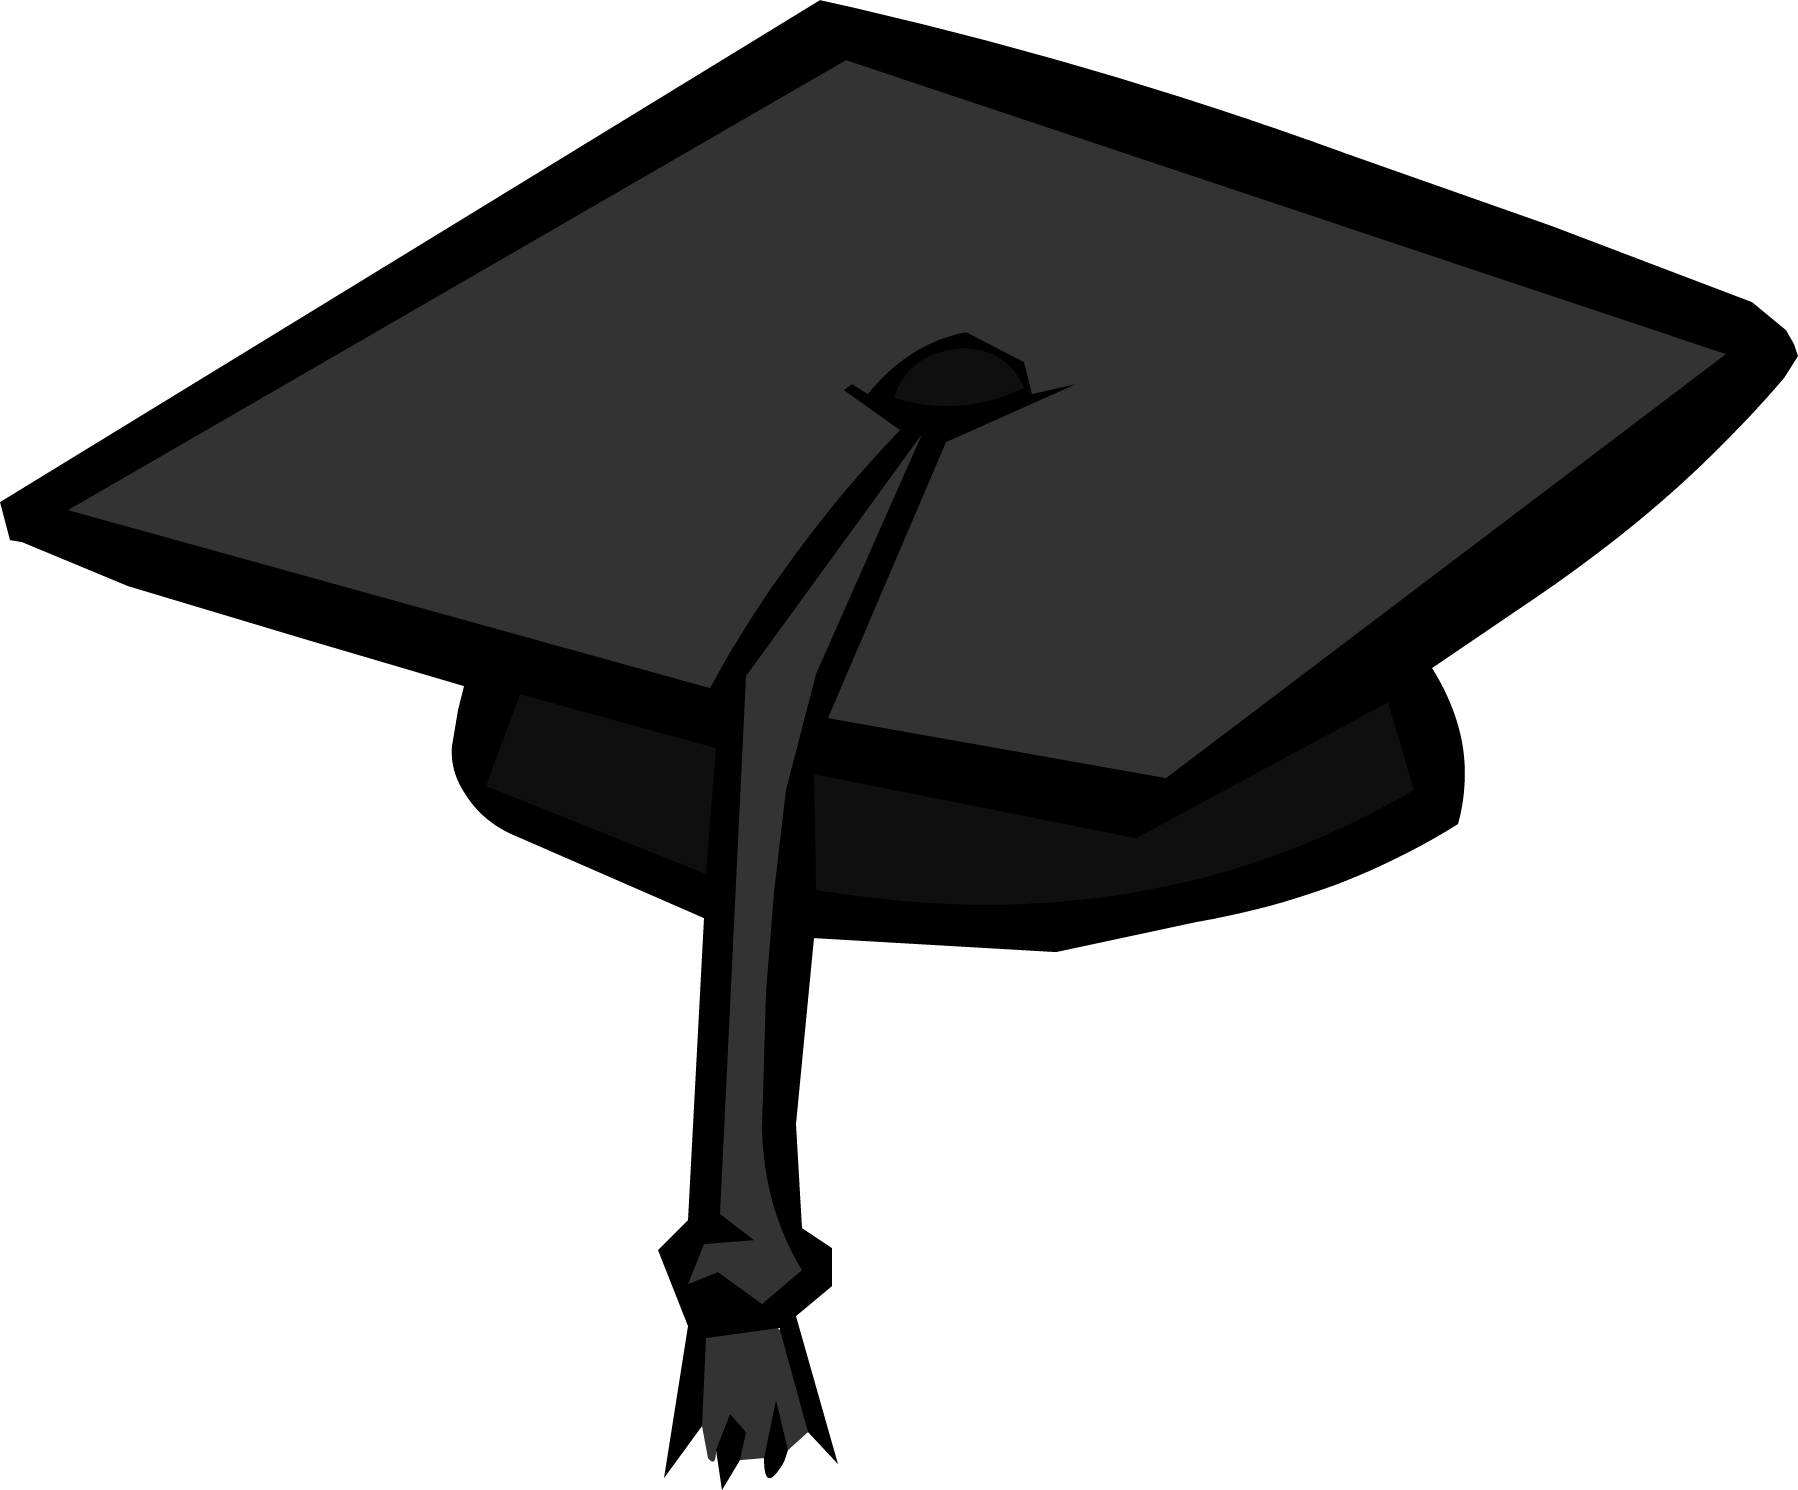 black graduation cap club penguin wiki fandom powered by wikia